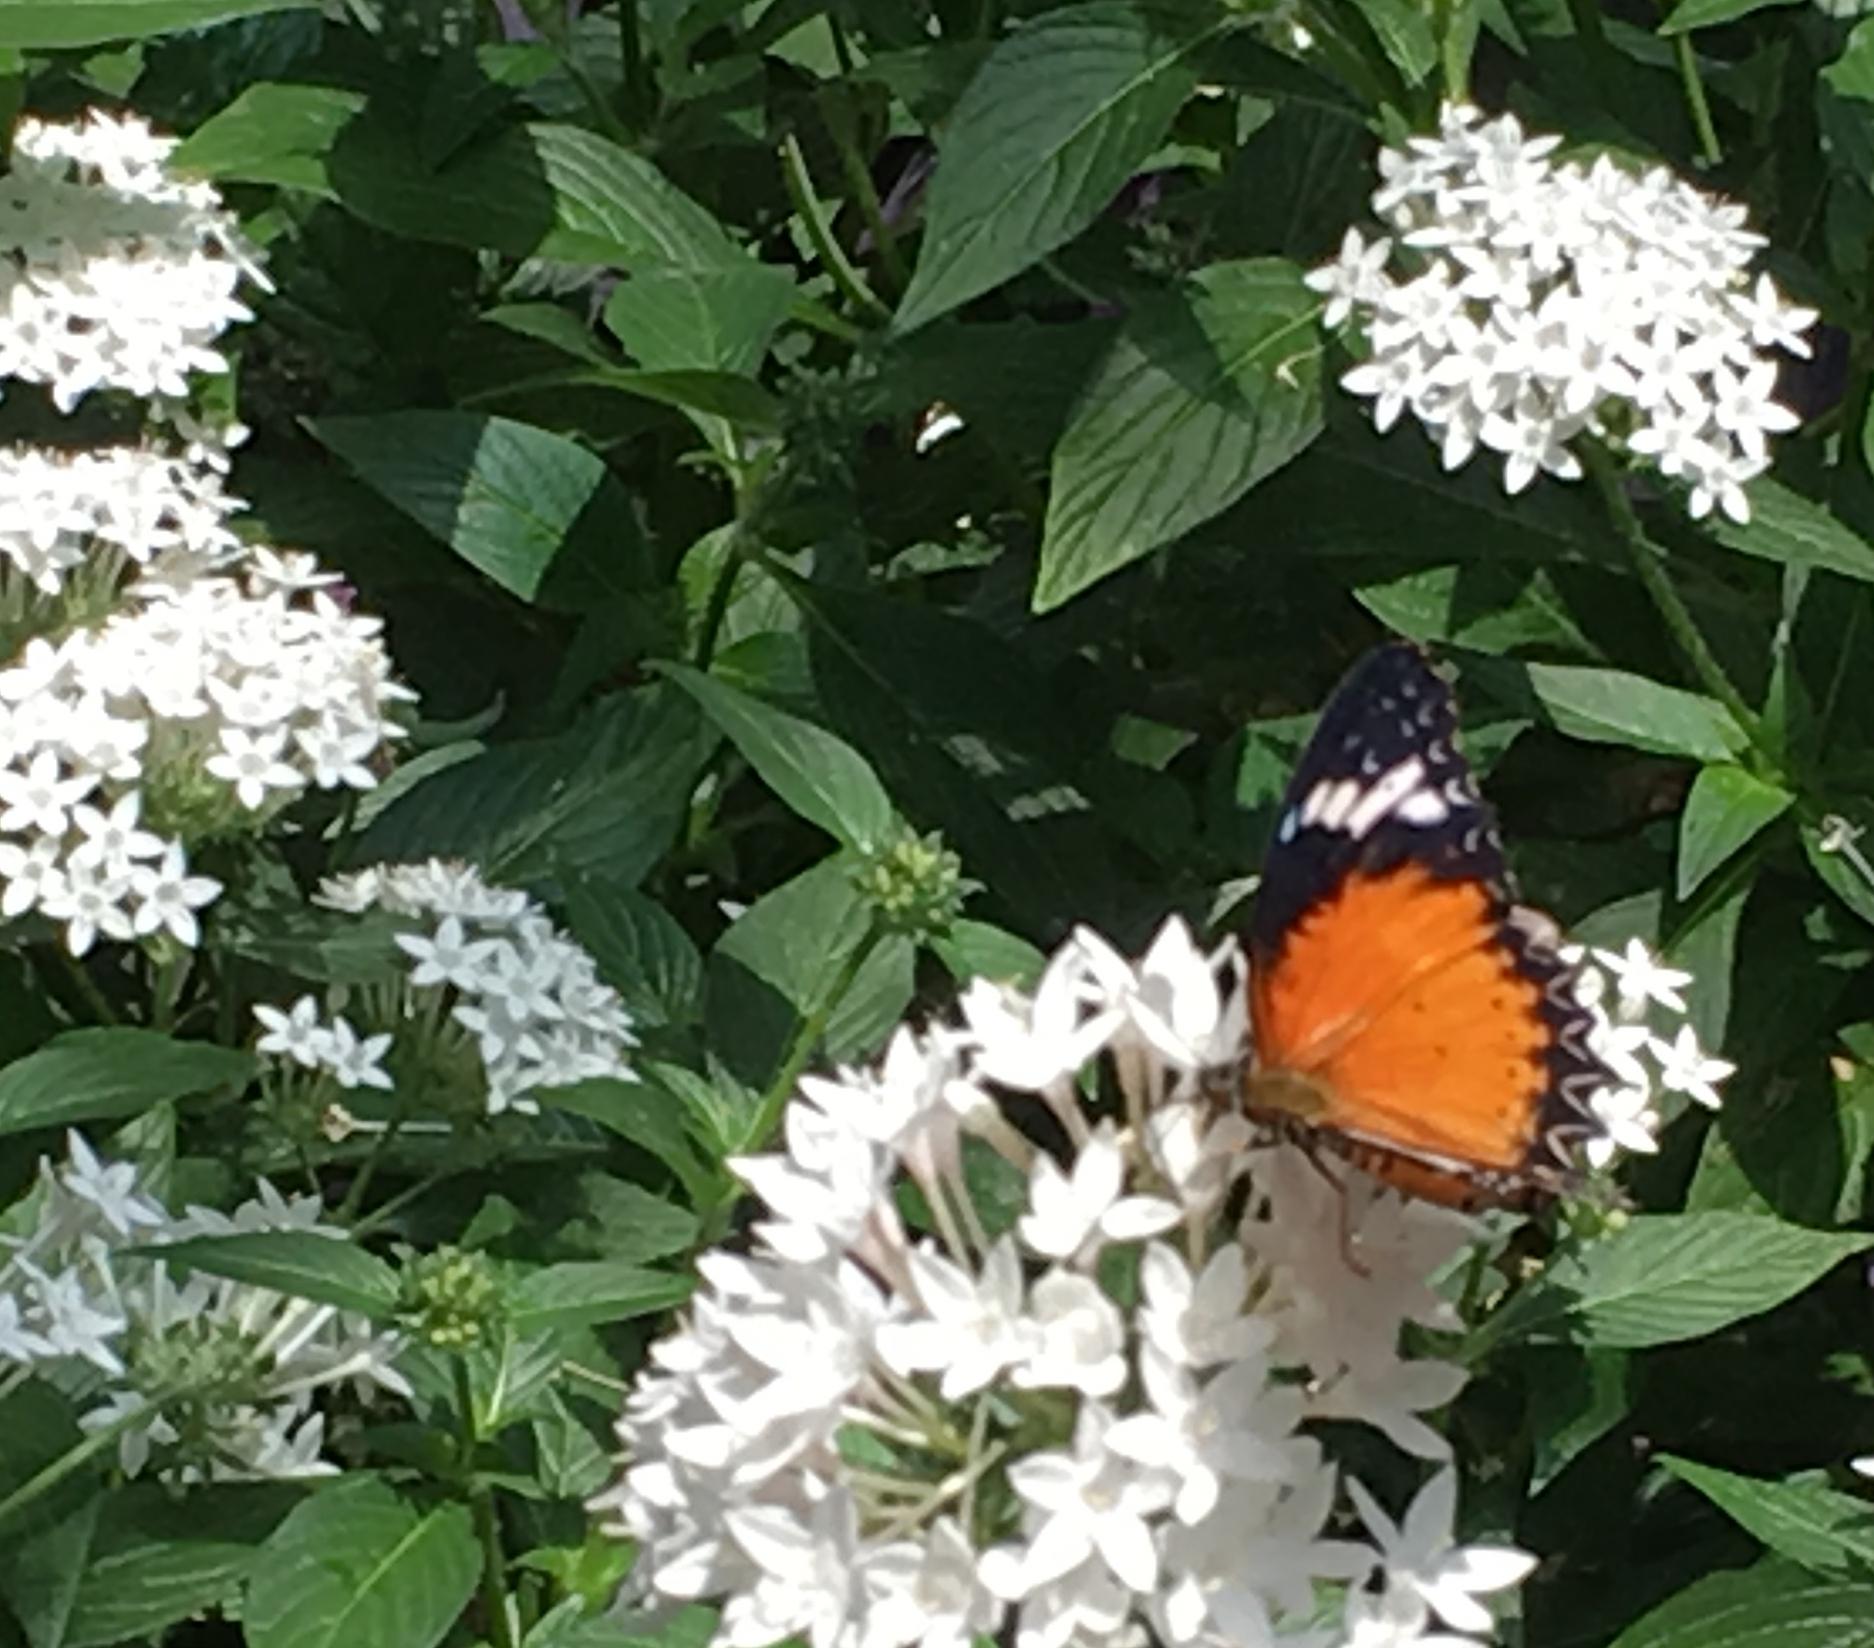 orange with black on white flowers